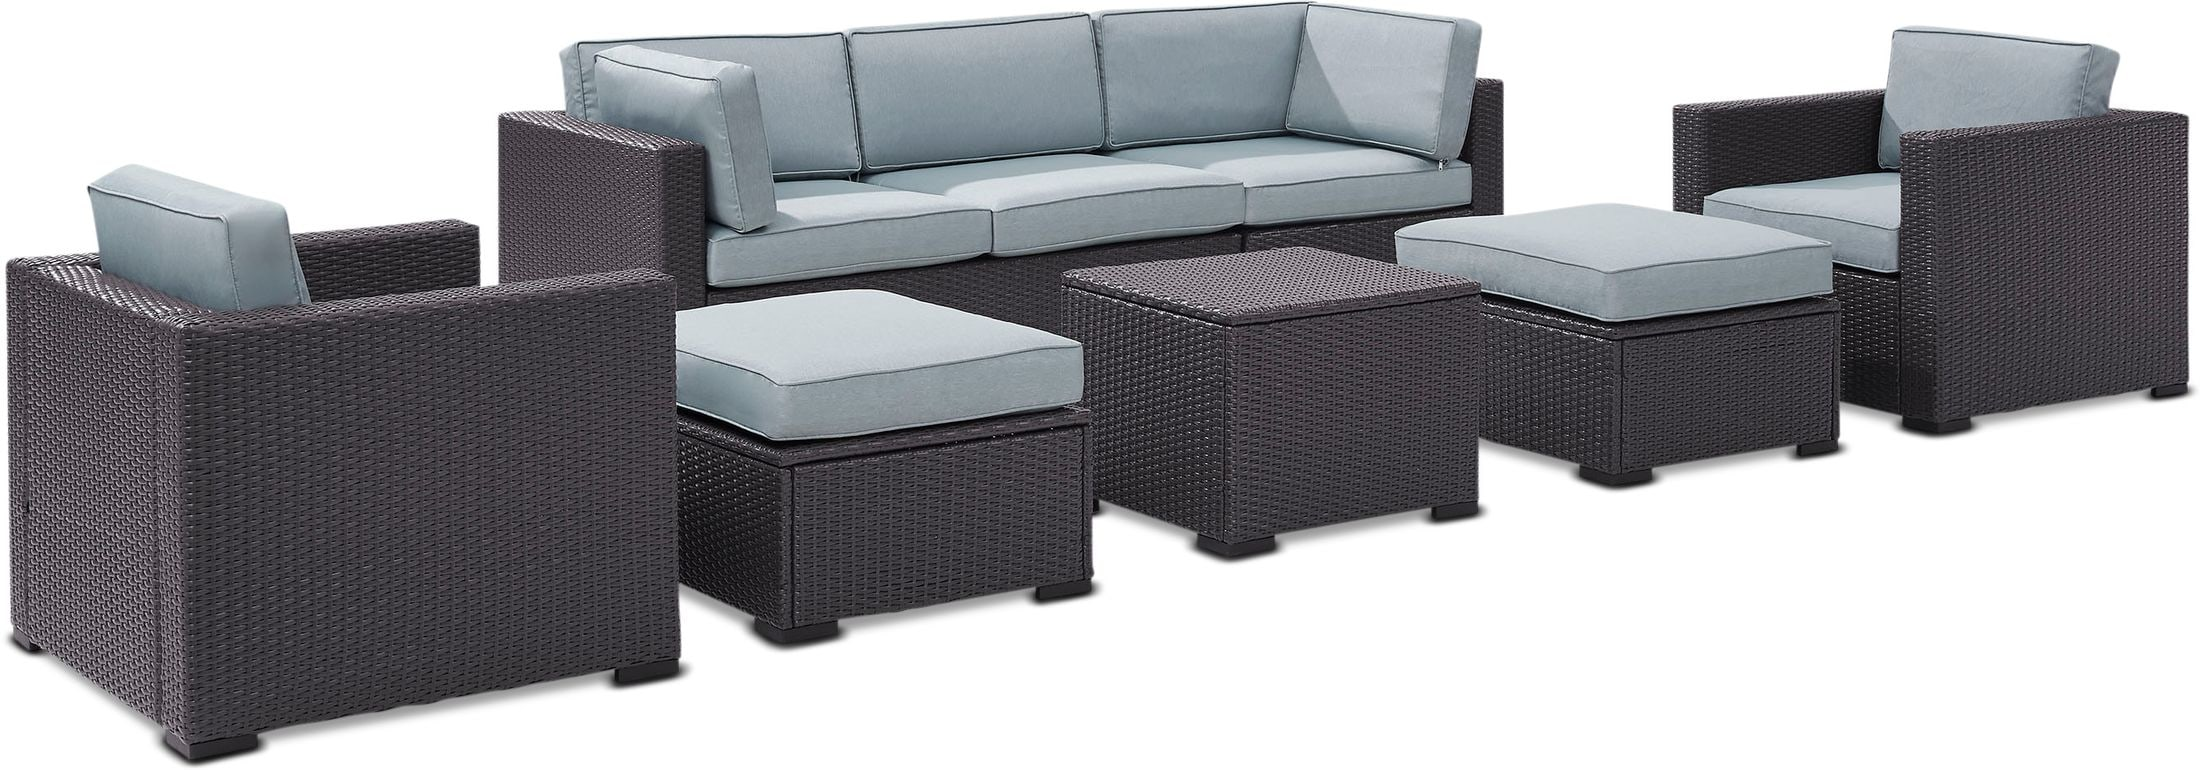 Outdoor Furniture - Isla 2-Piece Outdoor Sofa, 2 Armchairs, Coffee Table, 2 Ottomans